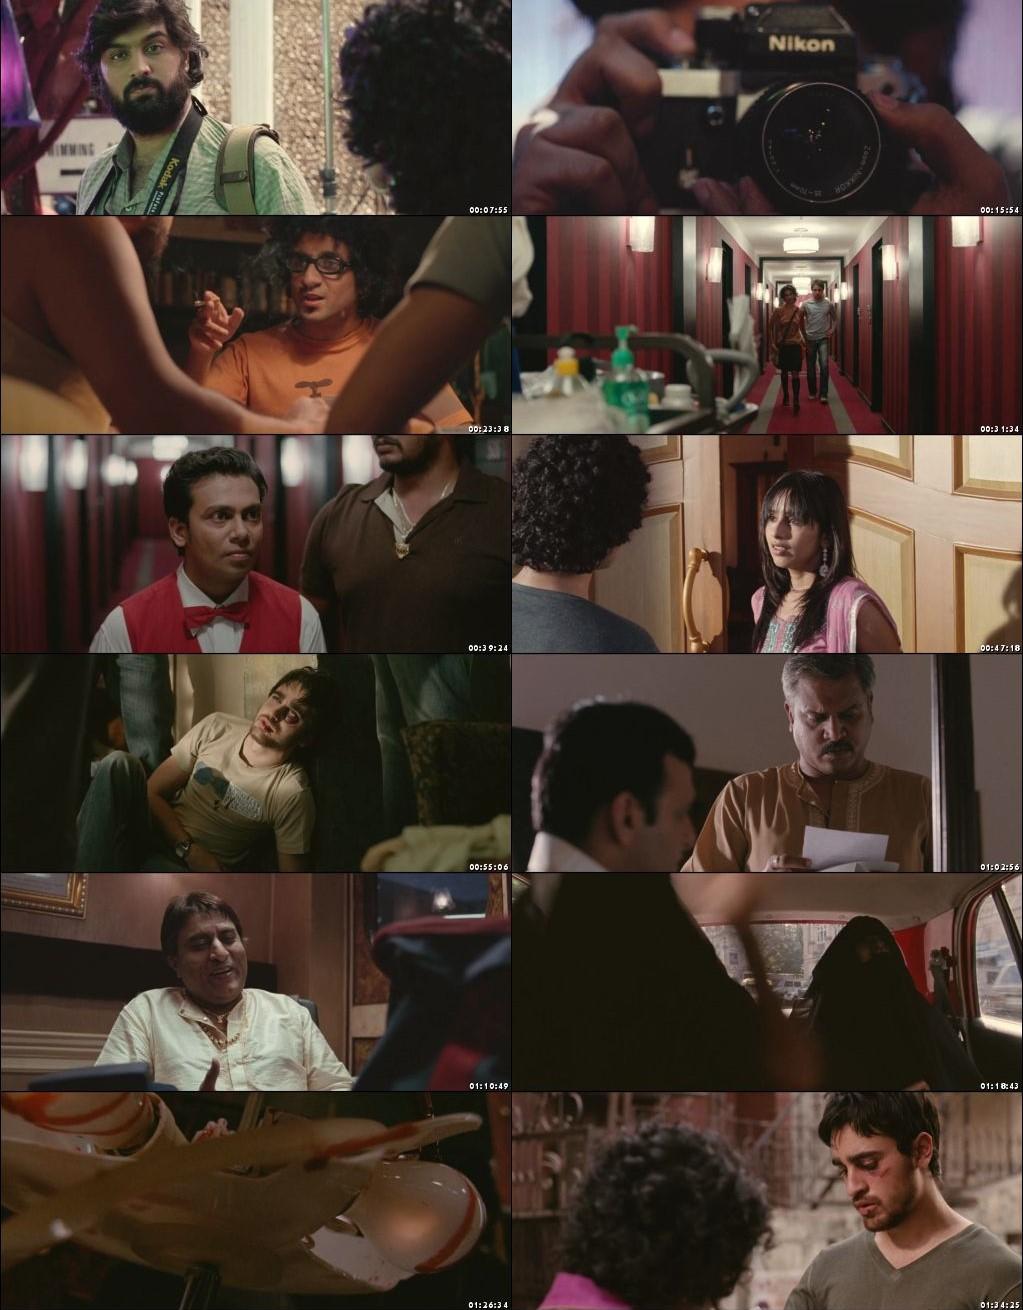 Delhi Belly 2011 Full Hindi Movie Online Watch